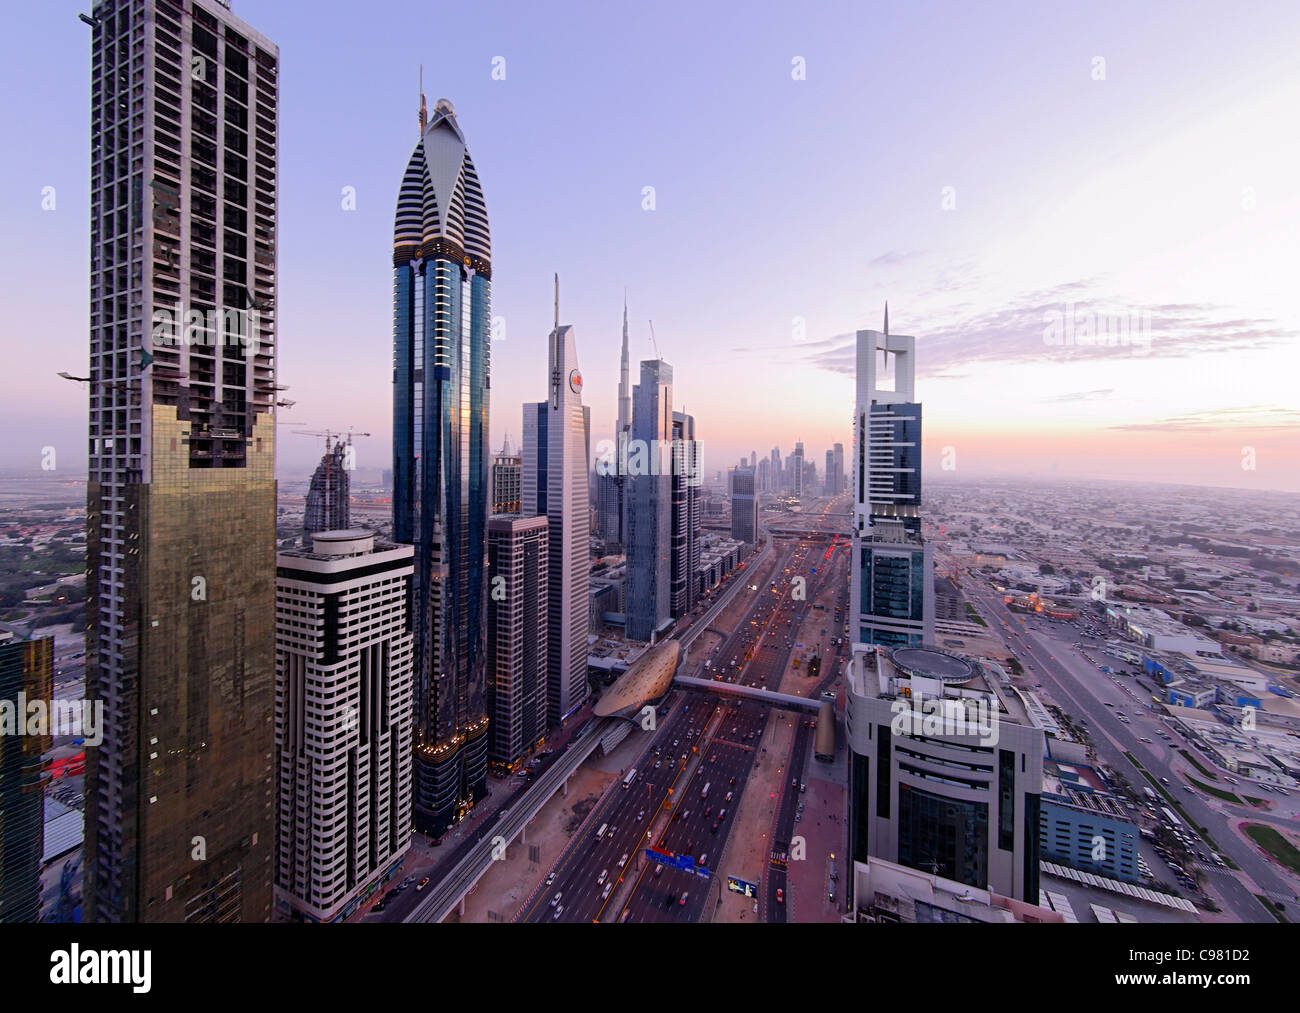 Blick auf downtown dubai t rme hochh user hotels moderne architektur financial district - Moderne architektur hauser ...